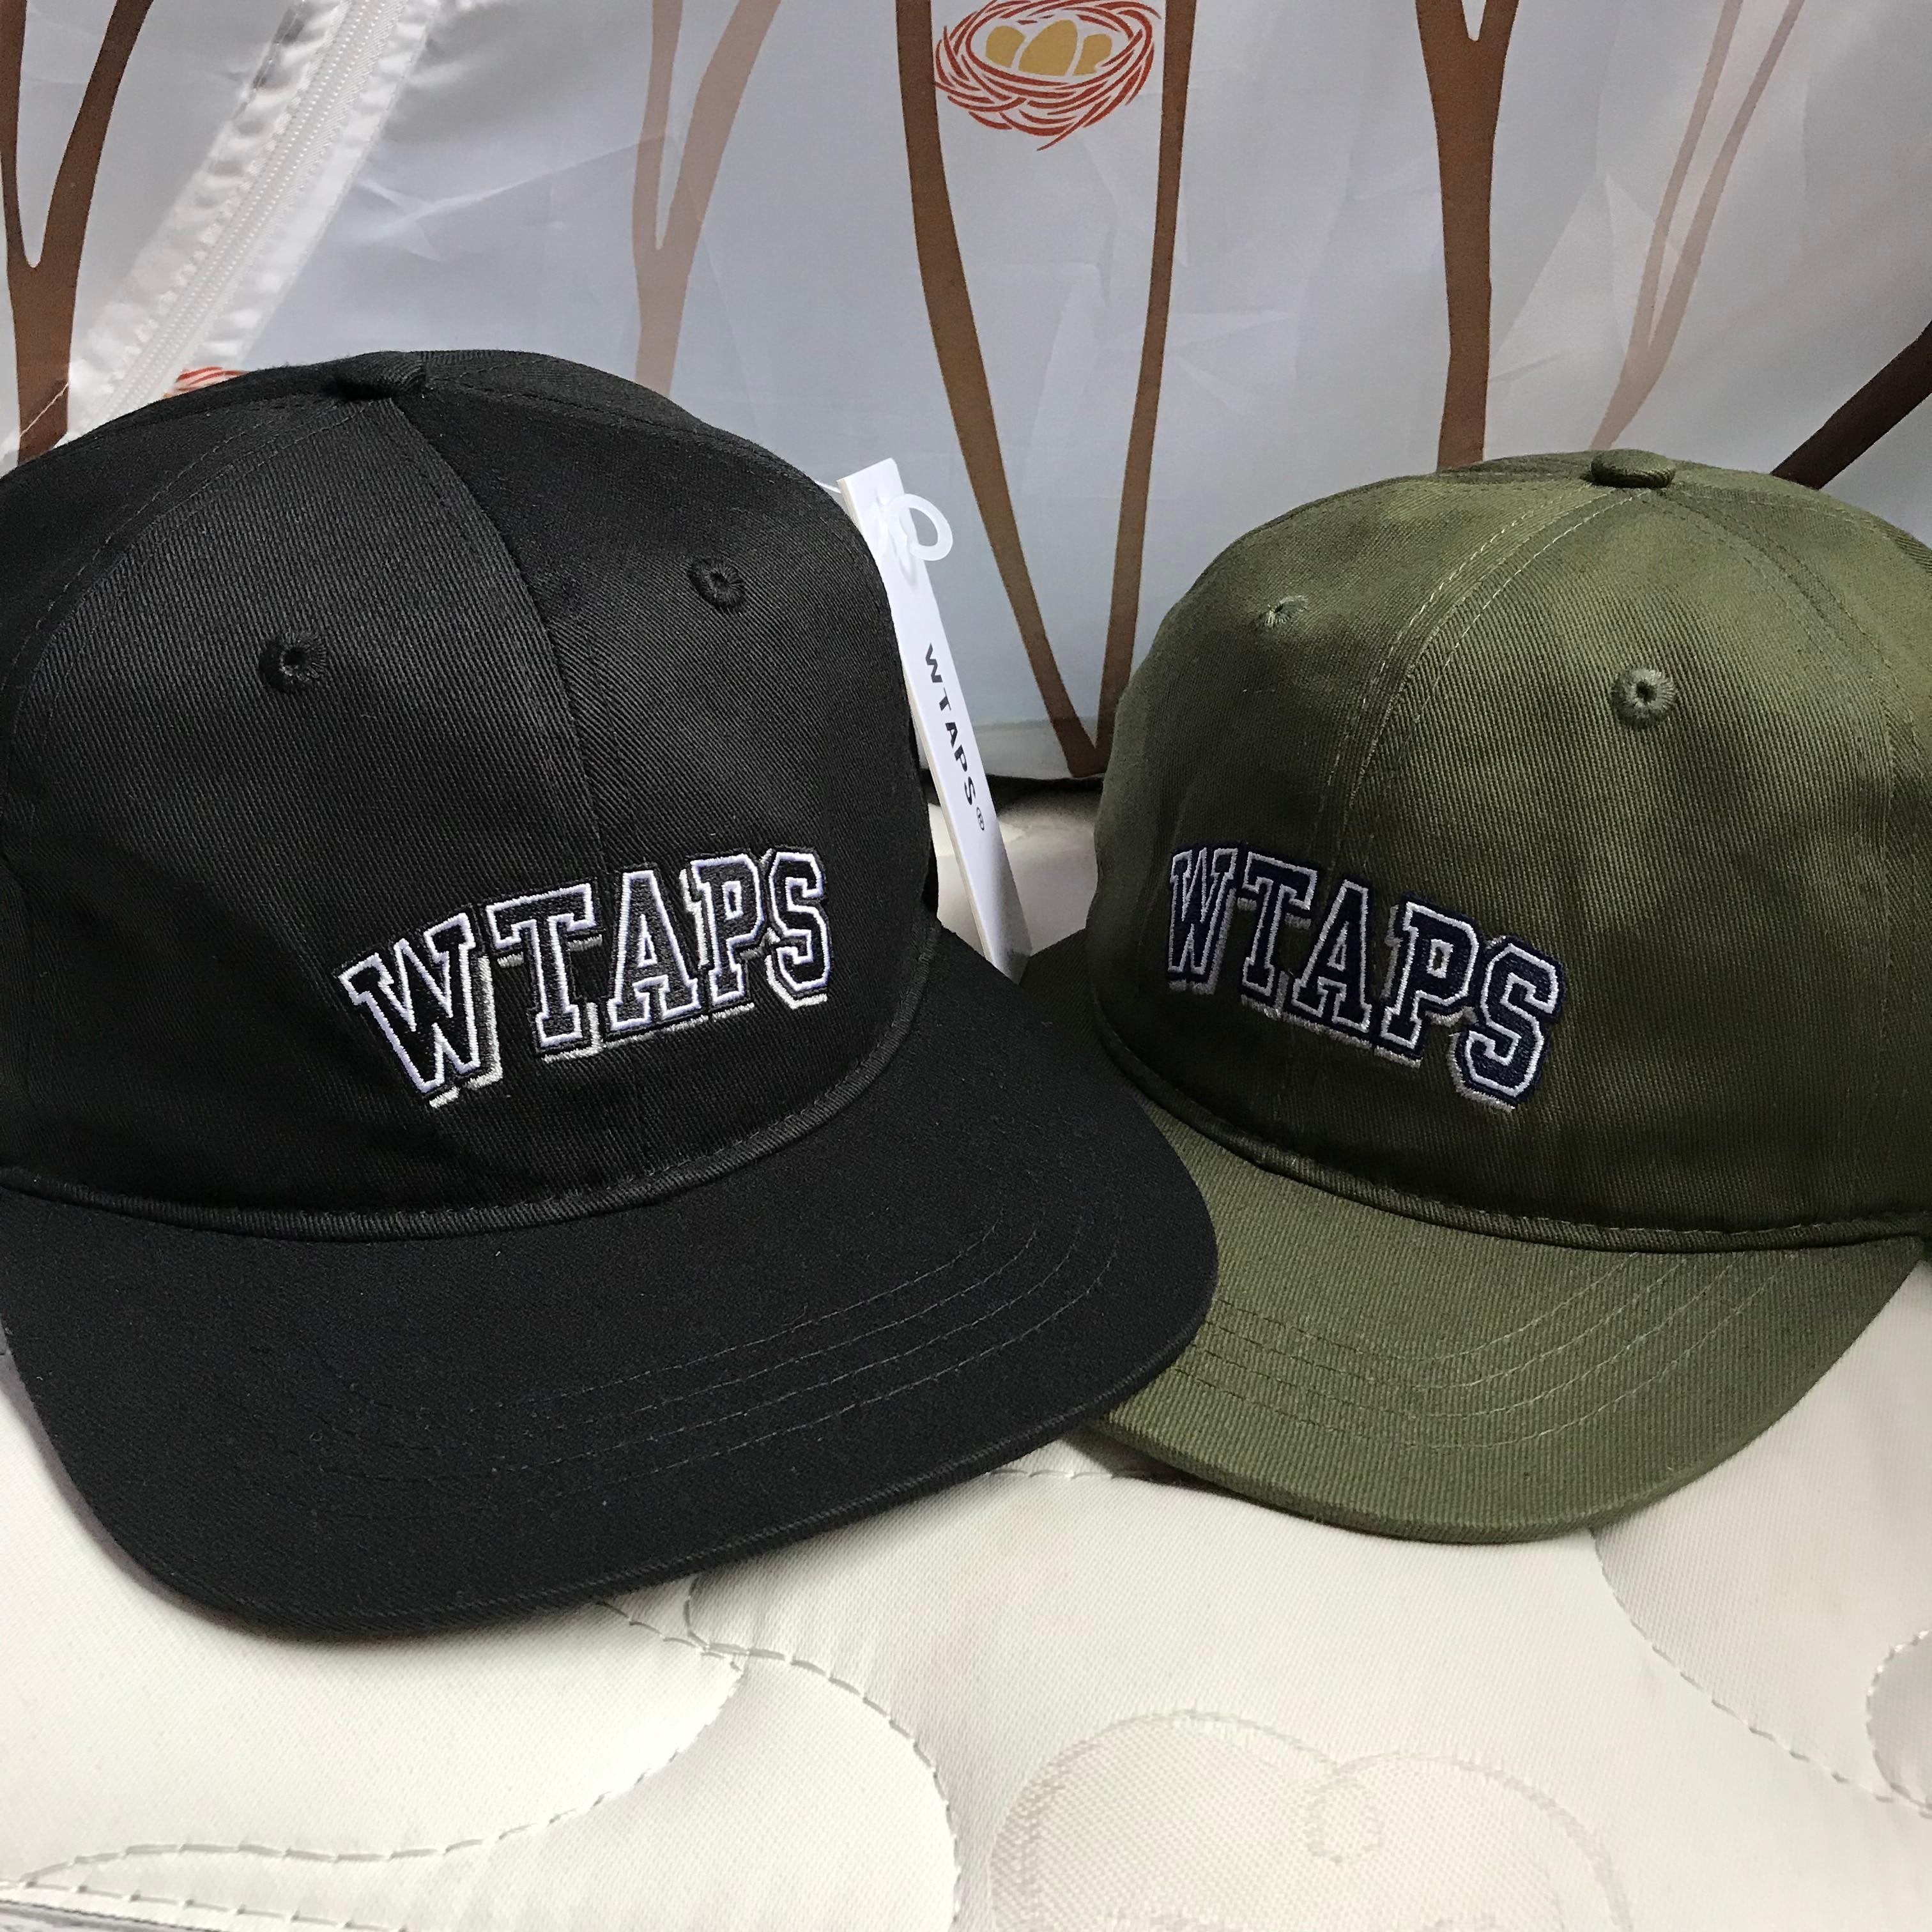 Marine Force Reconnaissance Unisex Adult Hats Classic Baseball Caps Peaked Cap